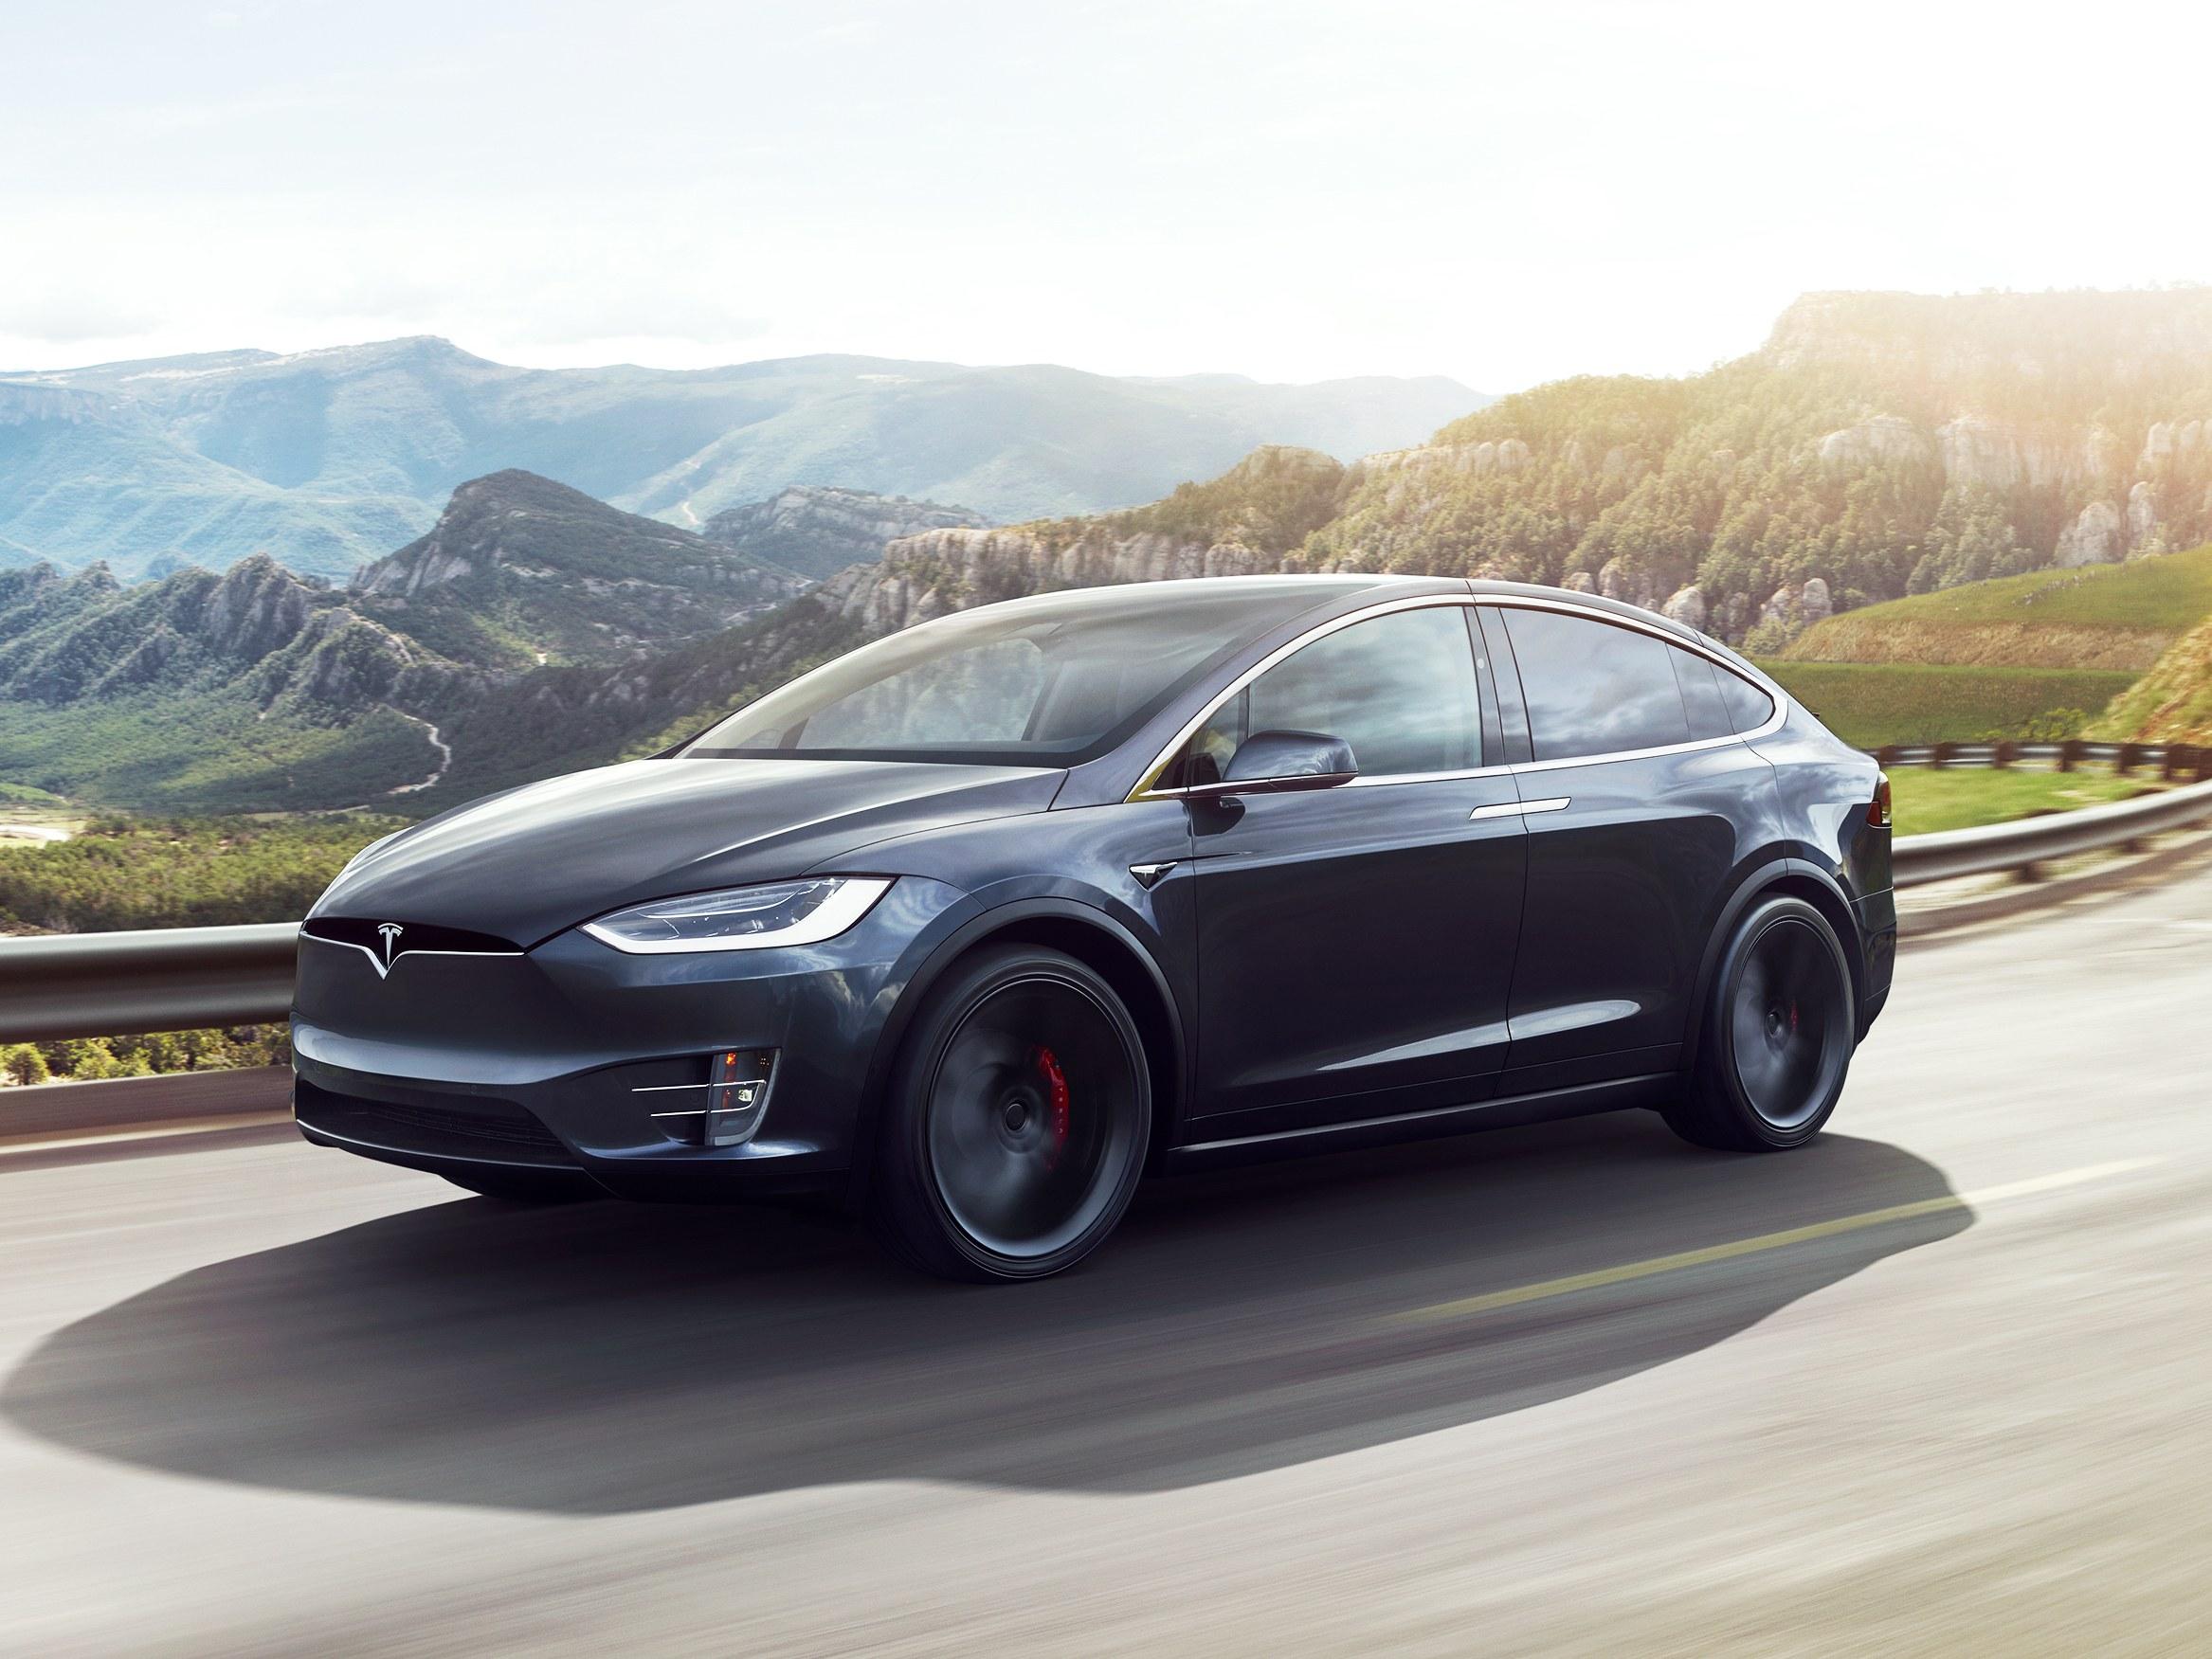 Tesla model X Source: cars.usnews.com